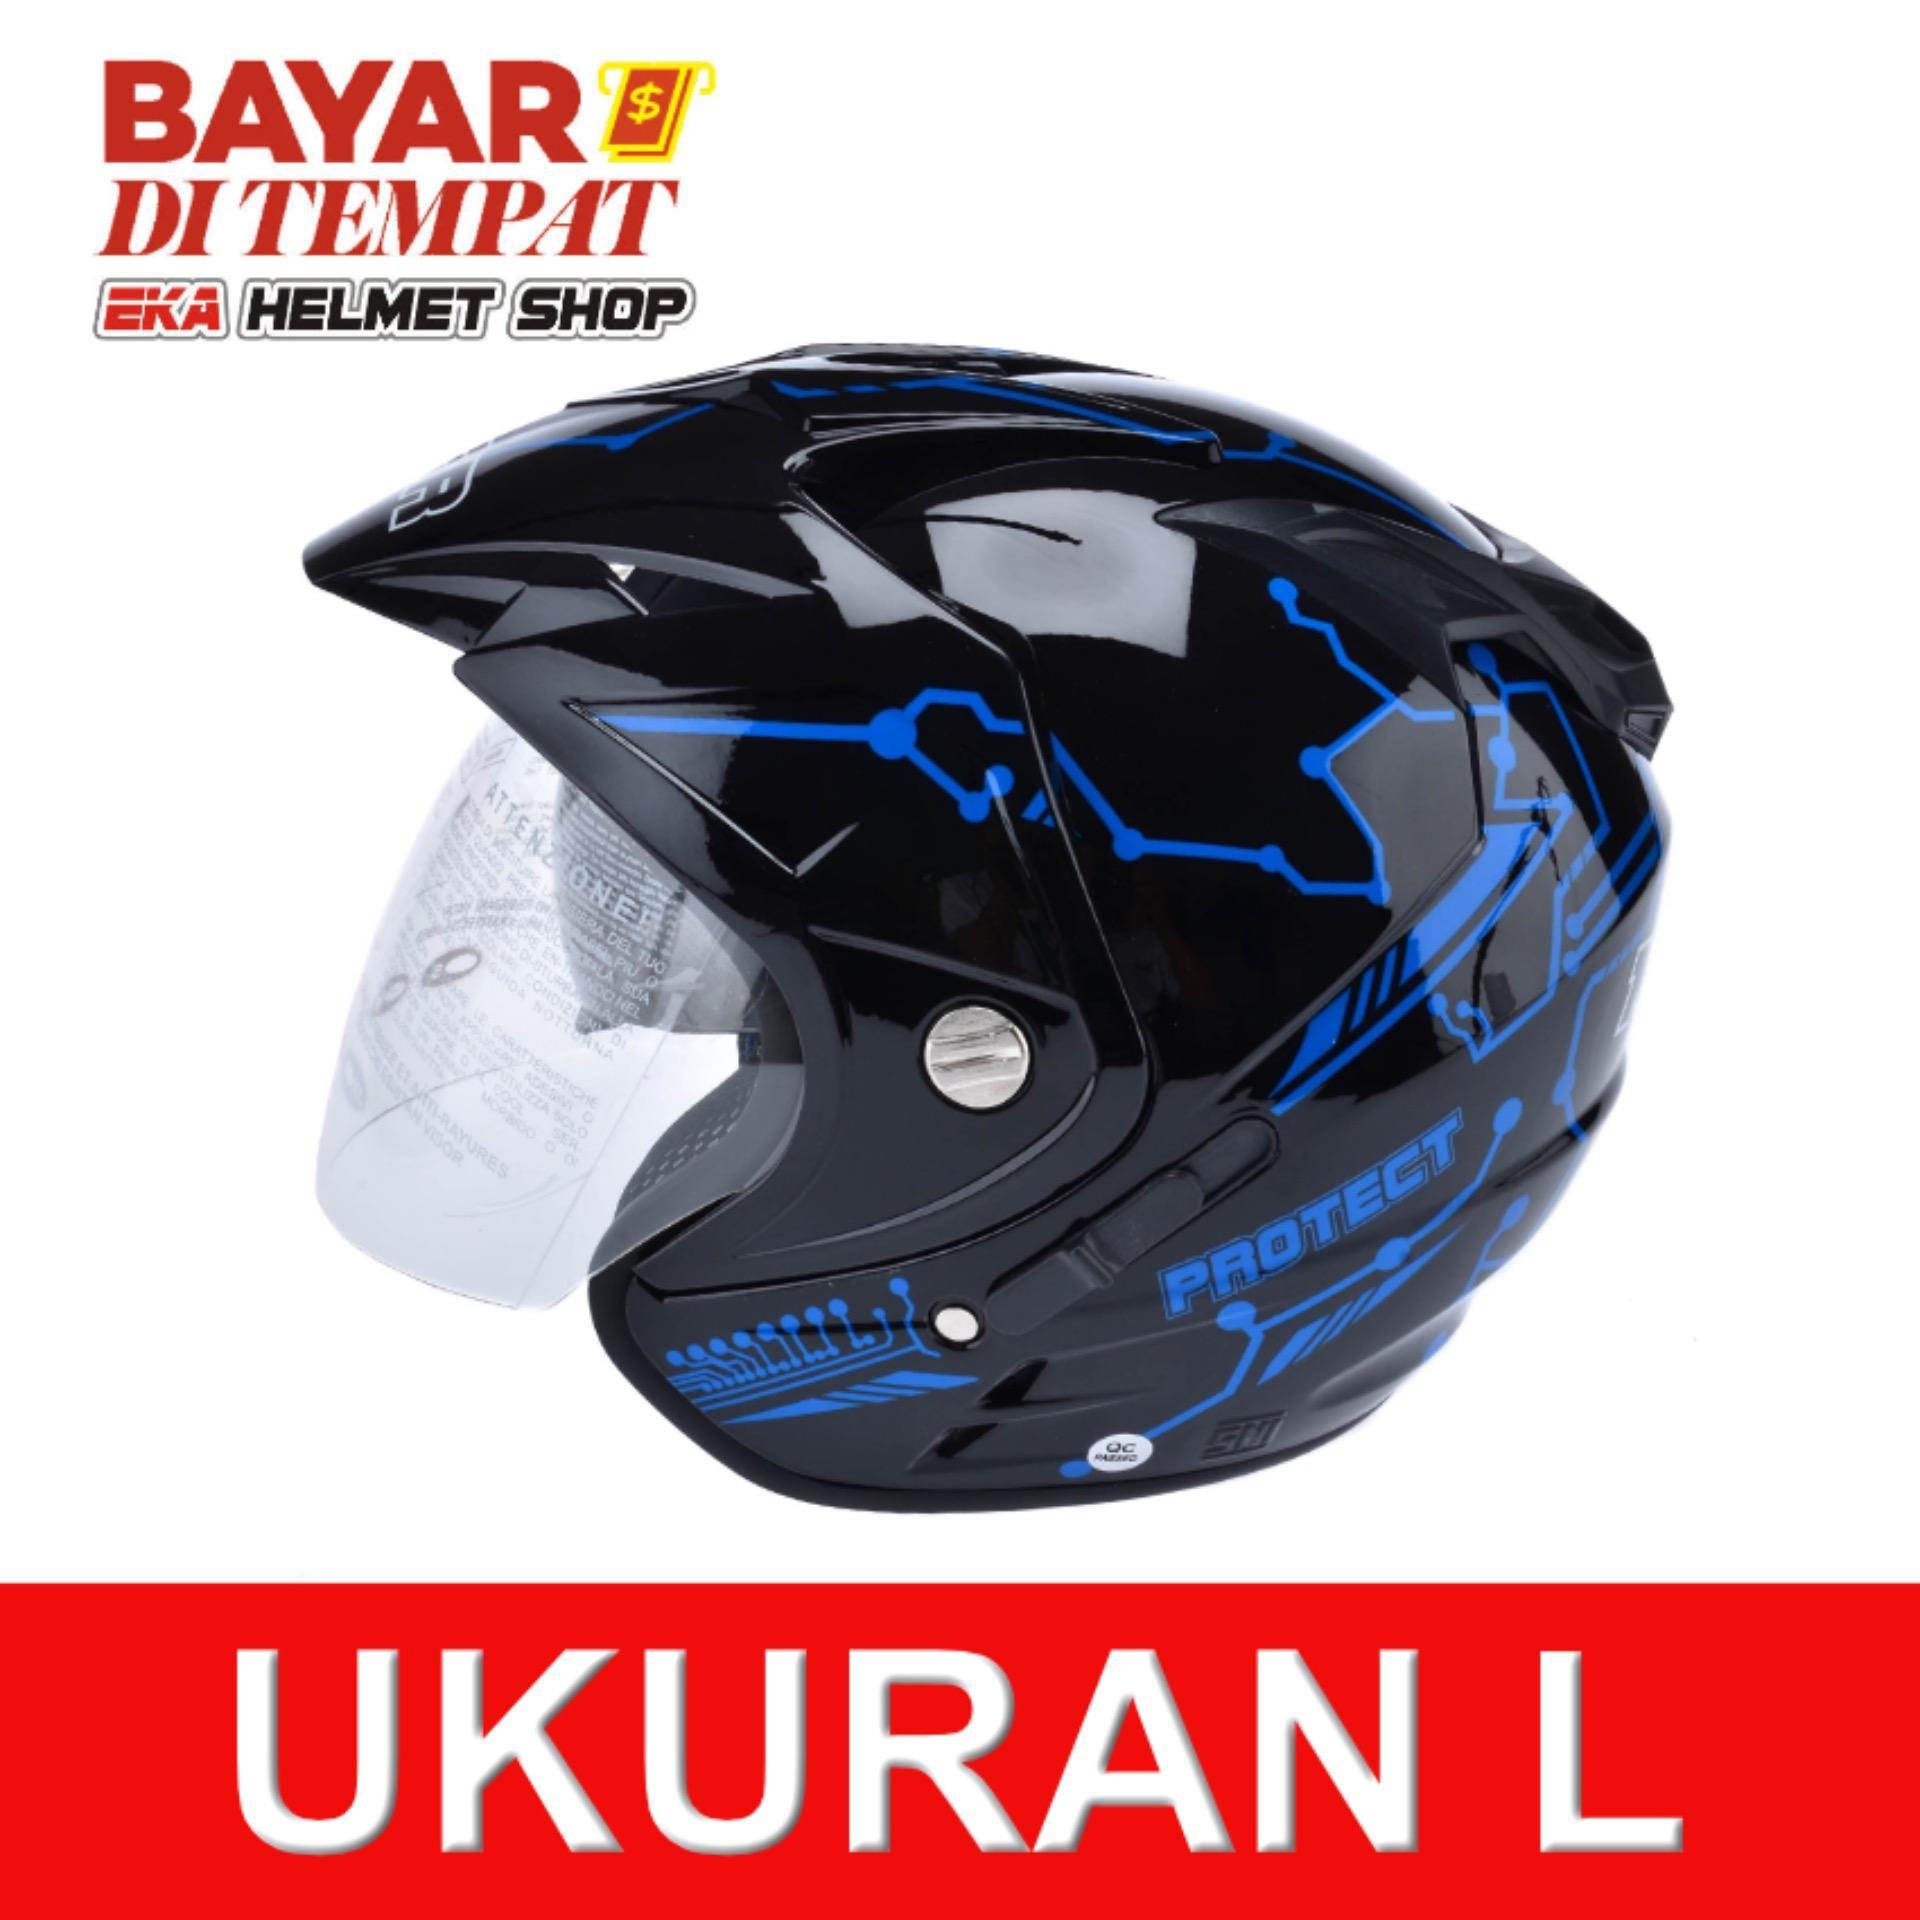 Harga Msr Helmet Impressive Protect Double Visor Hitam Biru Termahal